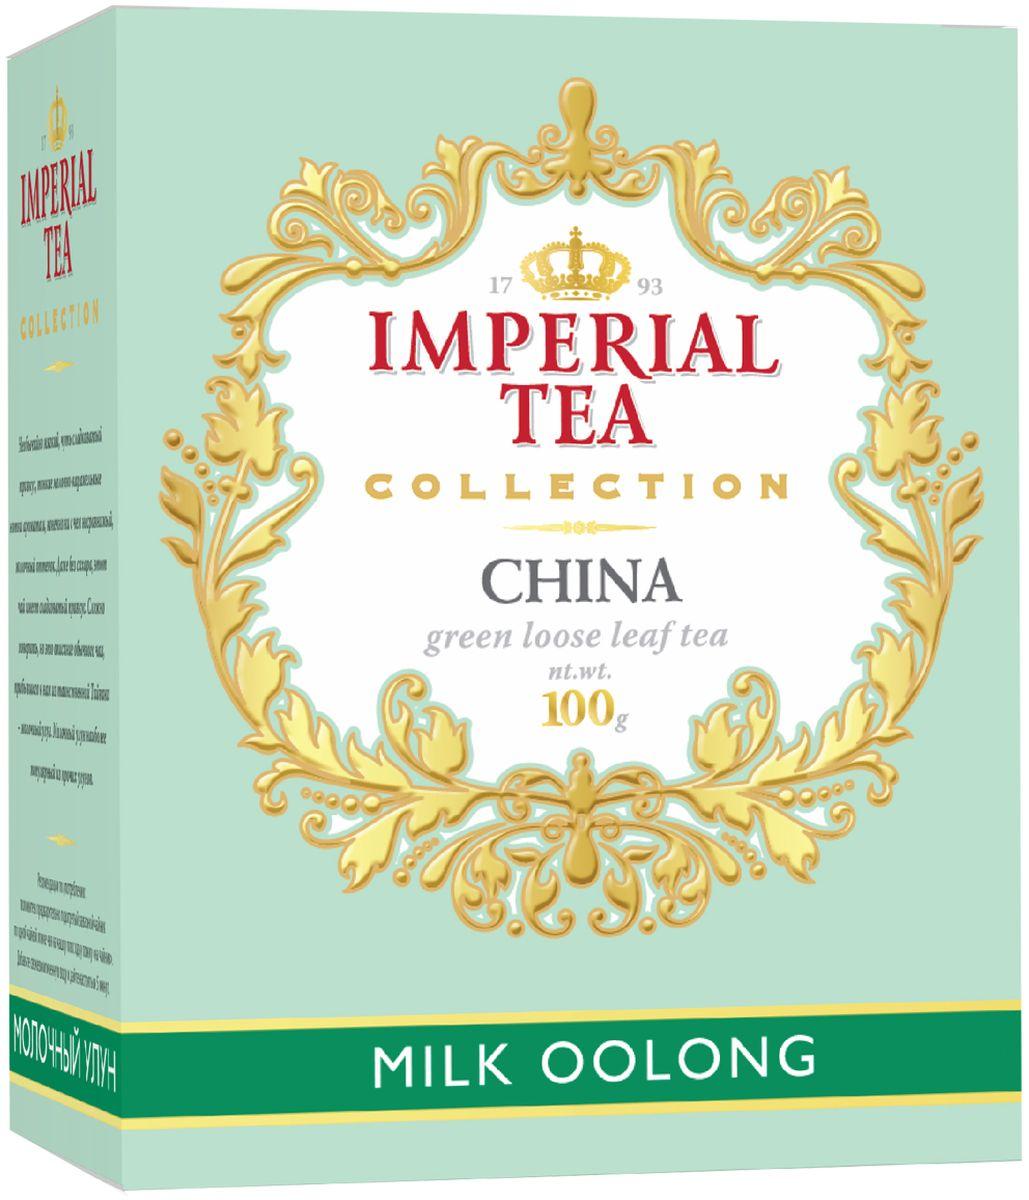 все цены на Императорский чай Collection Молочный Улун, 100 г онлайн